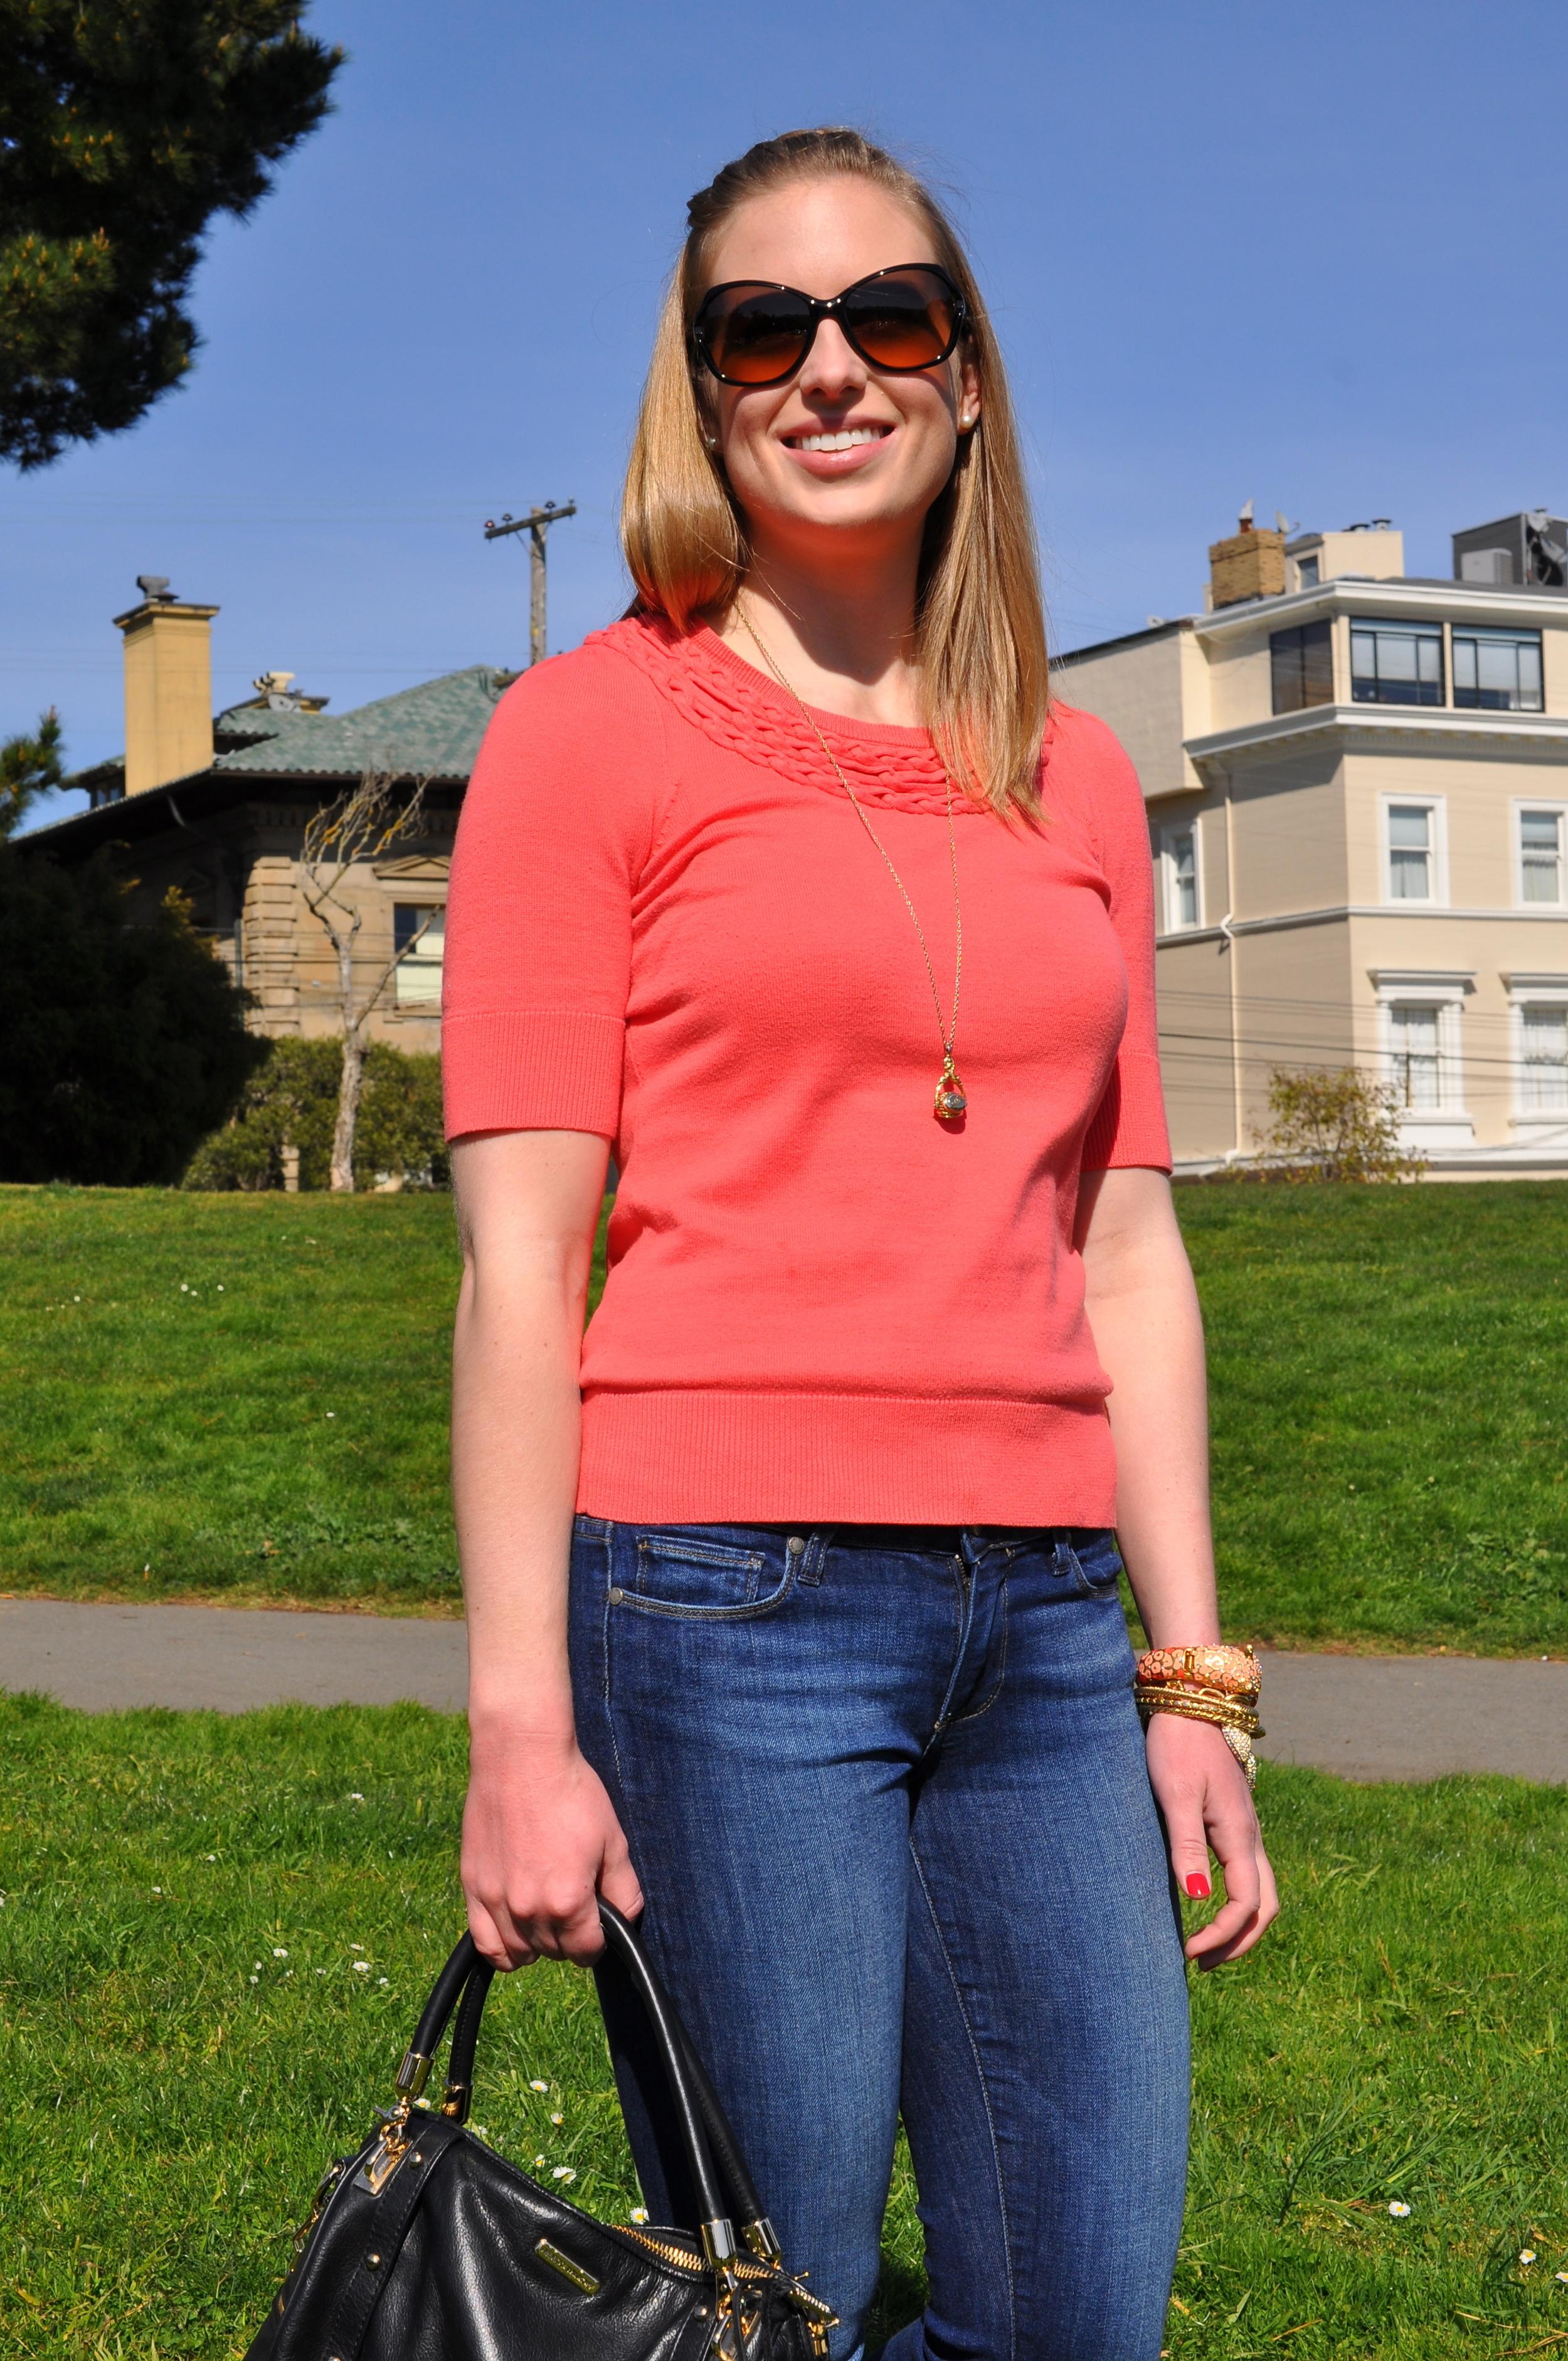 Anthropologie sweater (old), Paige jeans, Steve Madden flats, J. Crew bracelet (similar), J. Crew bangles, J. Crew bracelet, Rebecca Minkoff bag, Tory Burch sunglasses (similar)